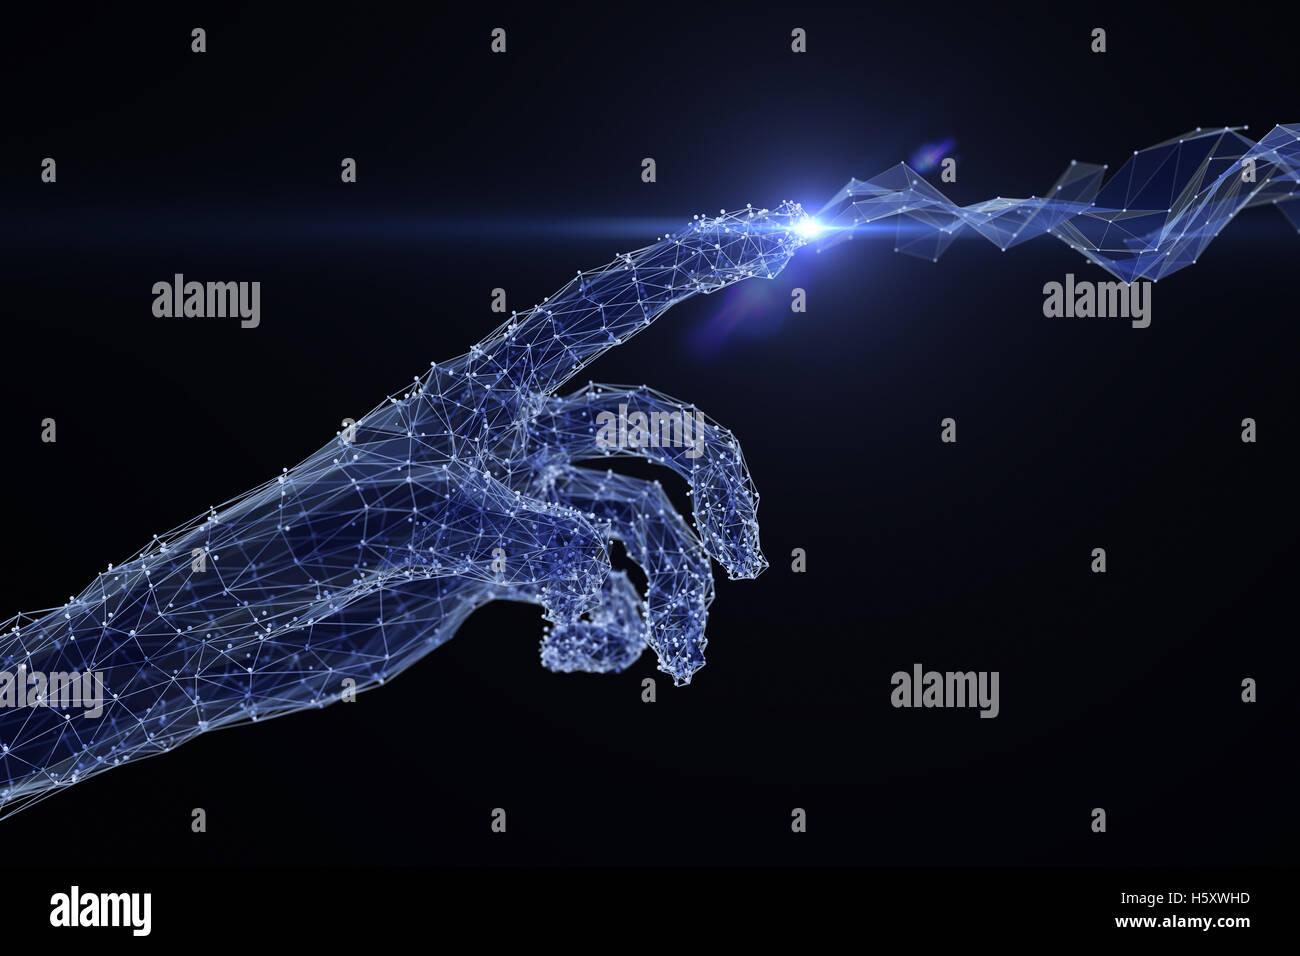 Tocar la red digital de mano Imagen De Stock